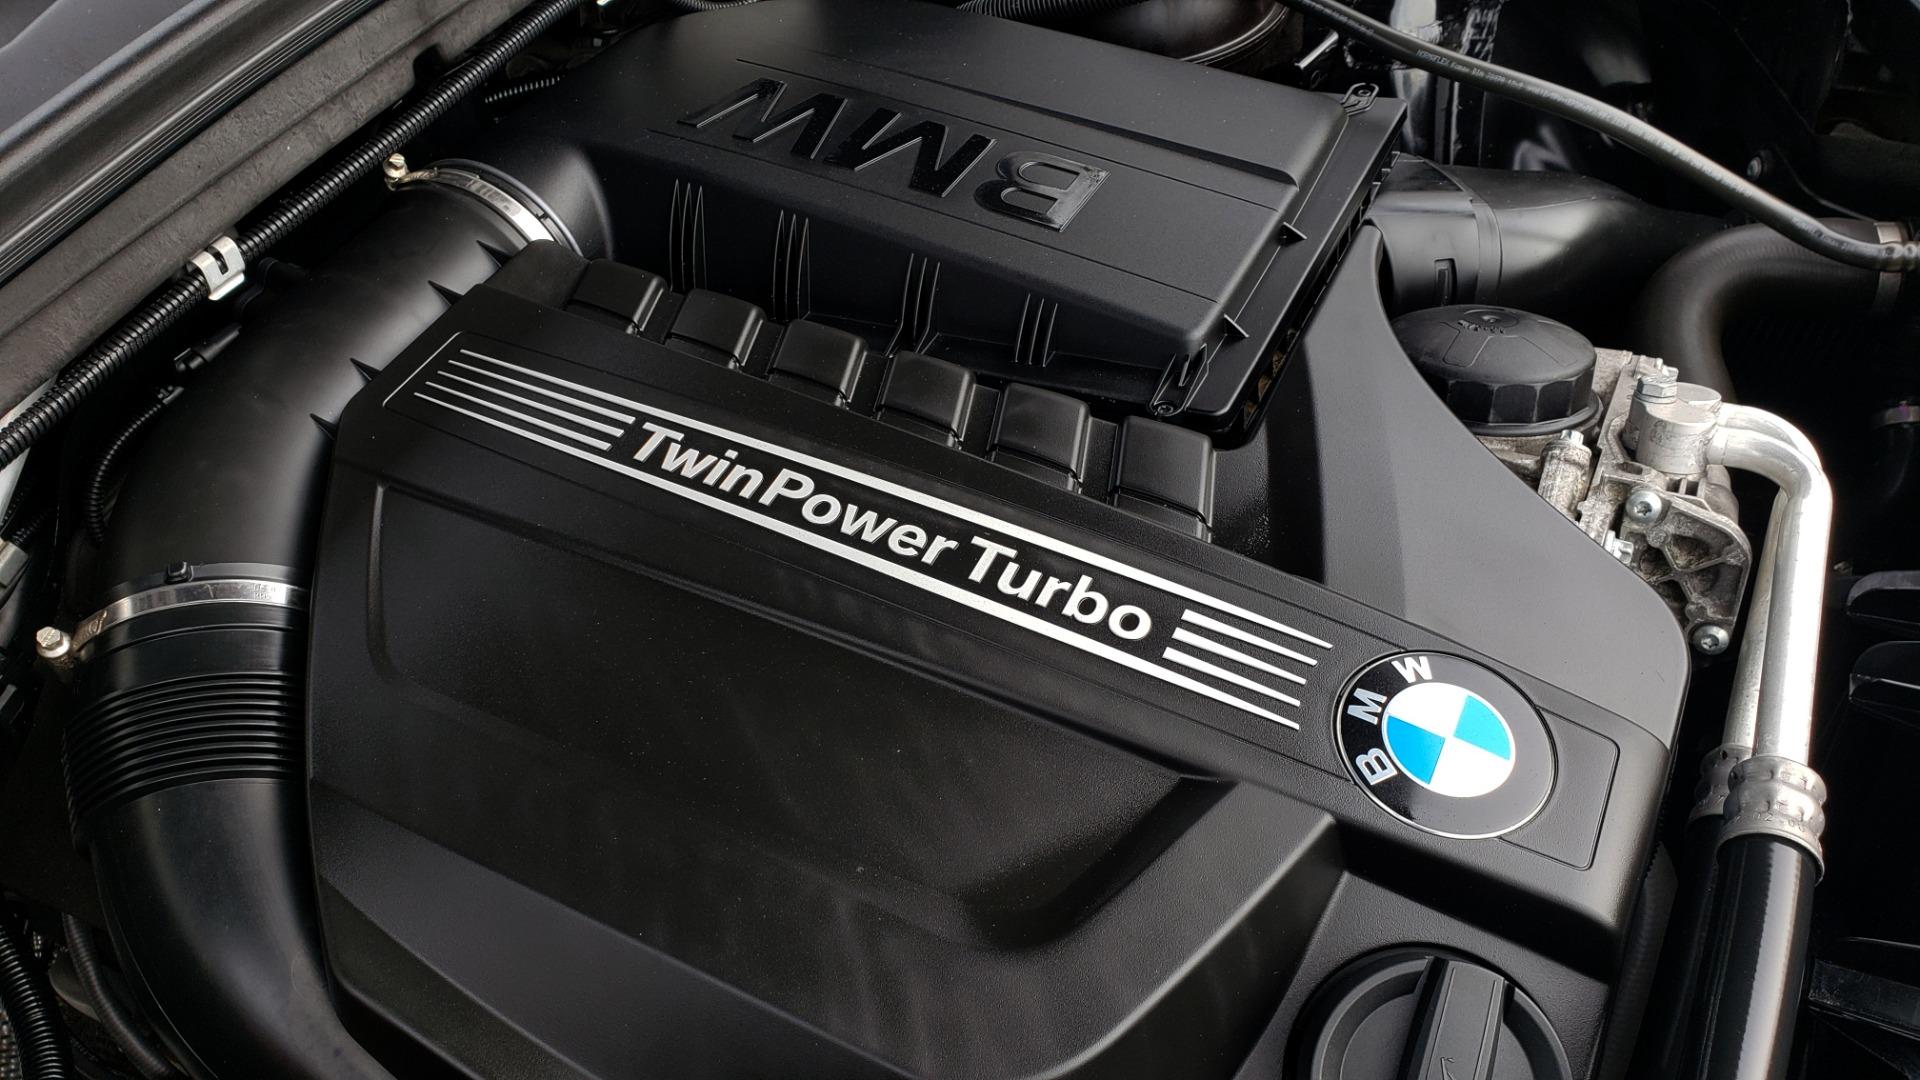 Used 2017 BMW X3 XDRIVE35I M-SPORT / DRVR ASST PLUS / TECHNOLOGY / HUD / BLIND SPOT for sale Sold at Formula Imports in Charlotte NC 28227 12